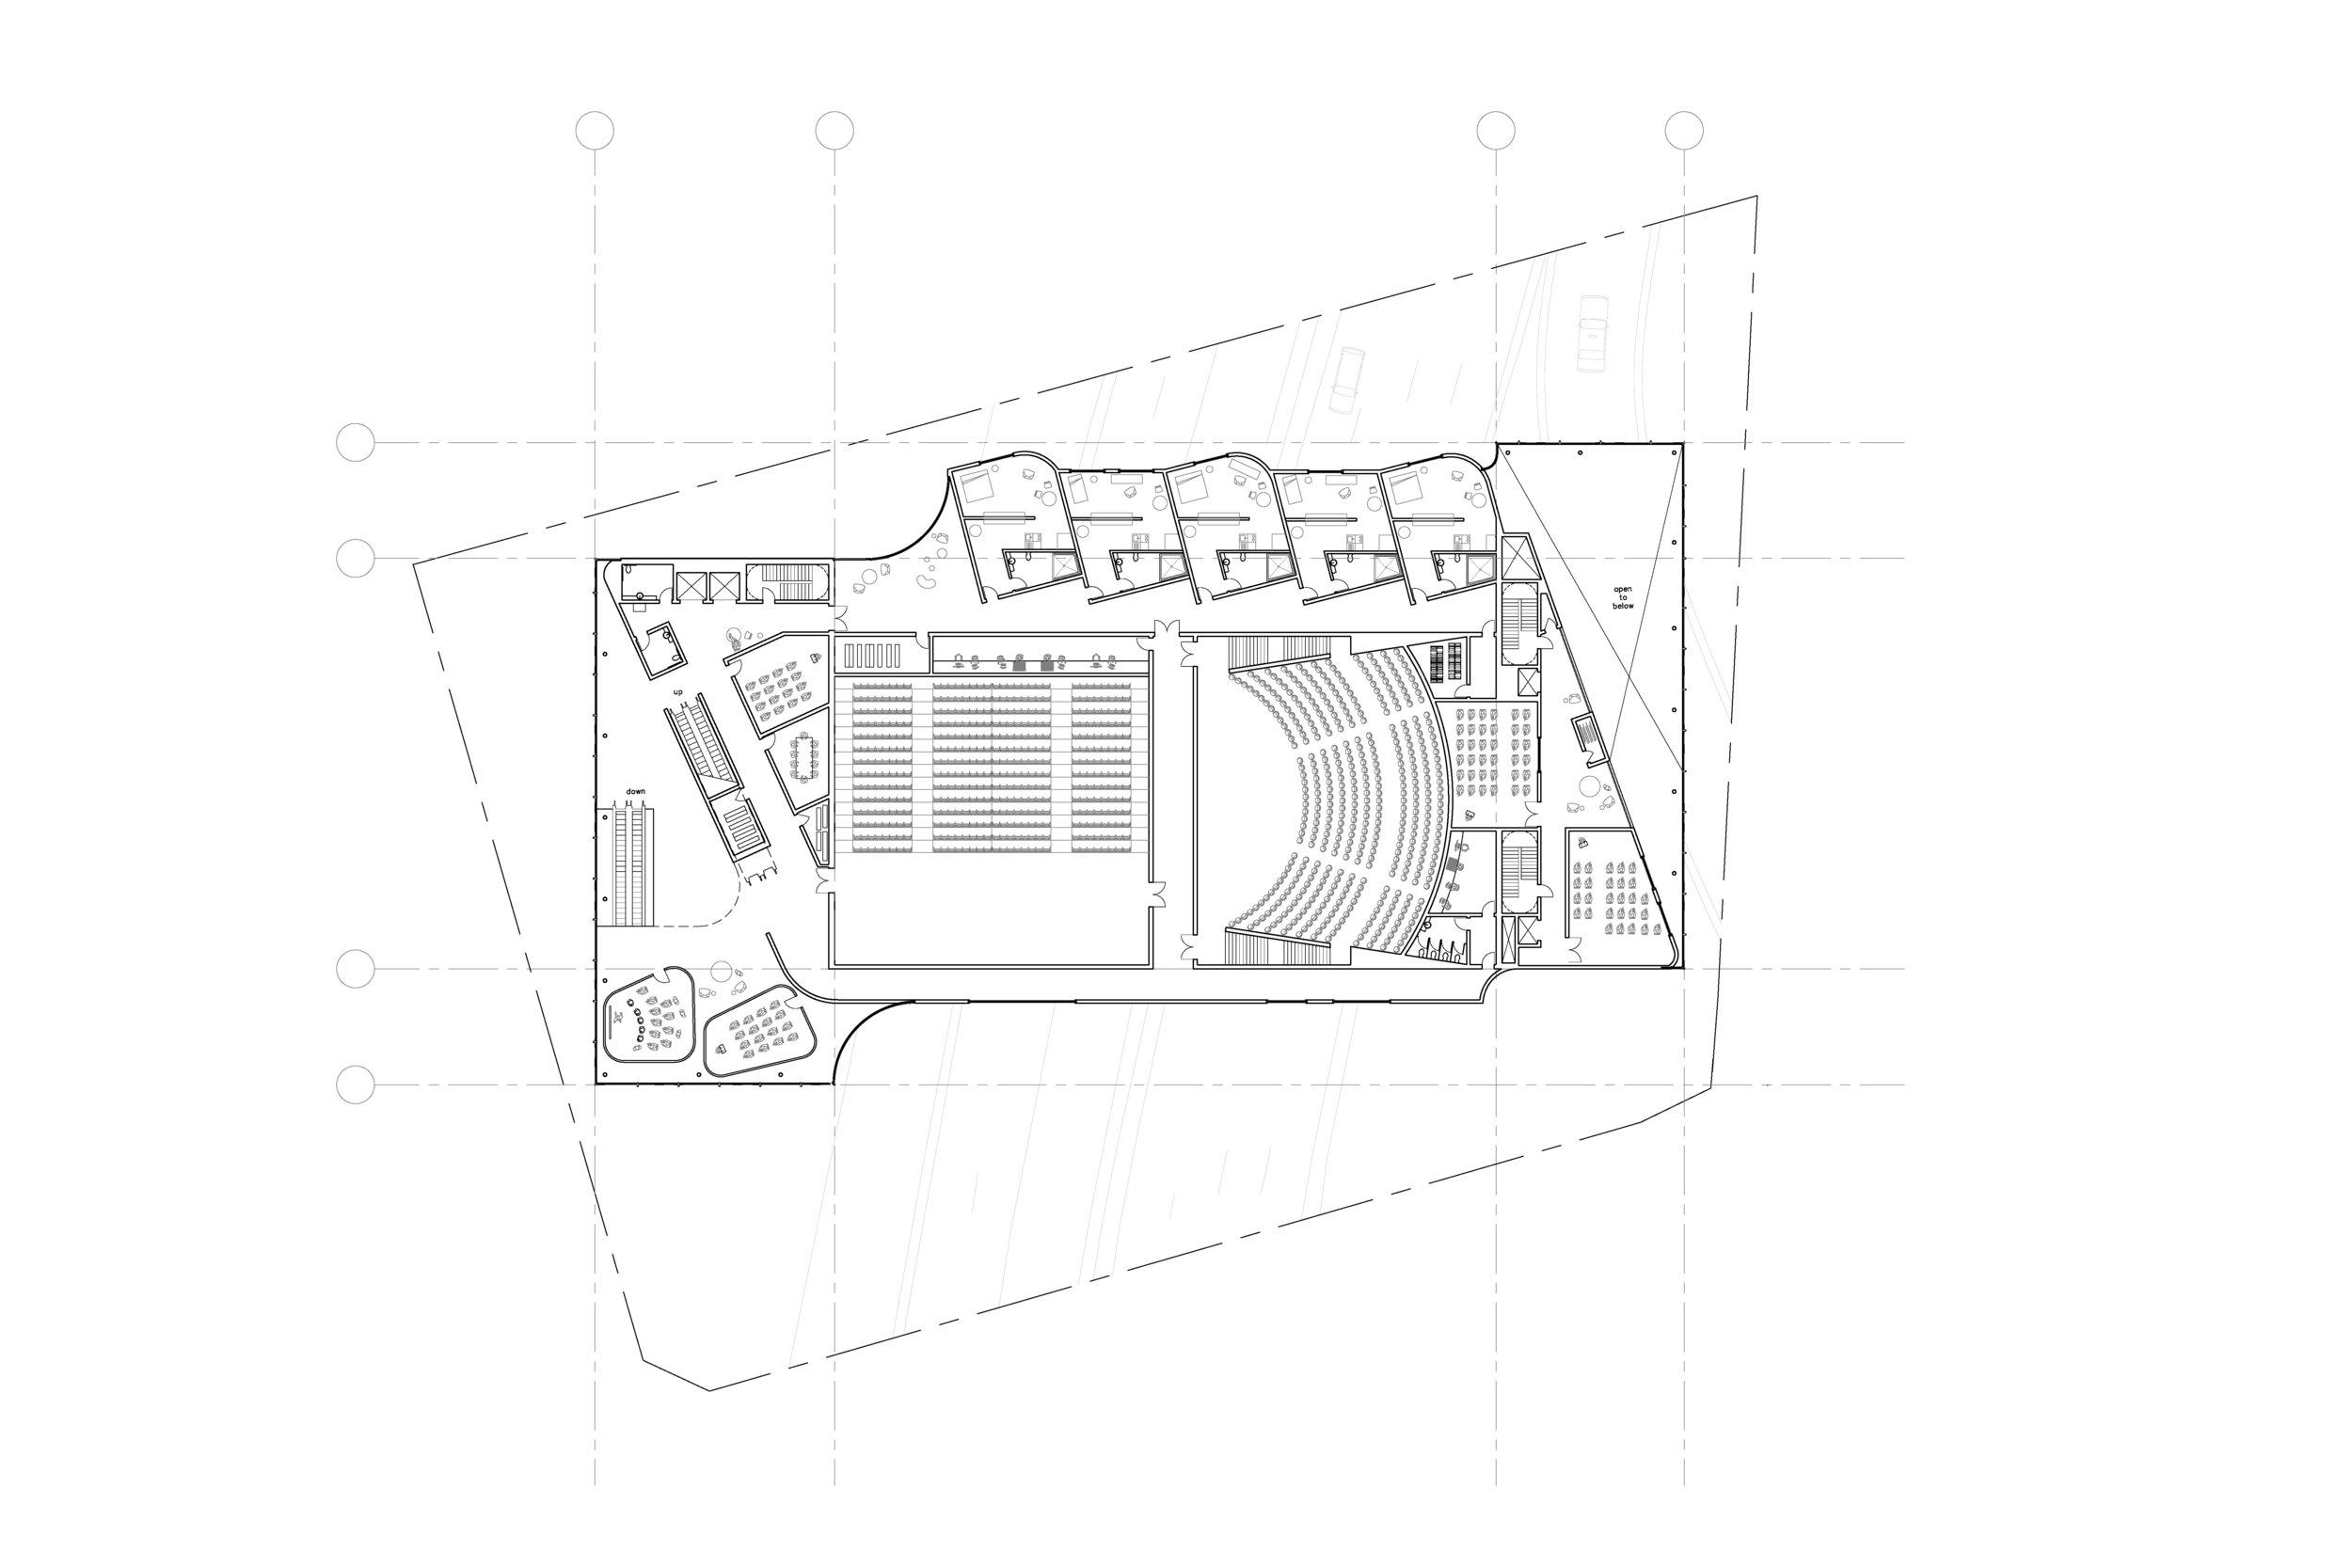 Level 6, Studio Theater / Black Box